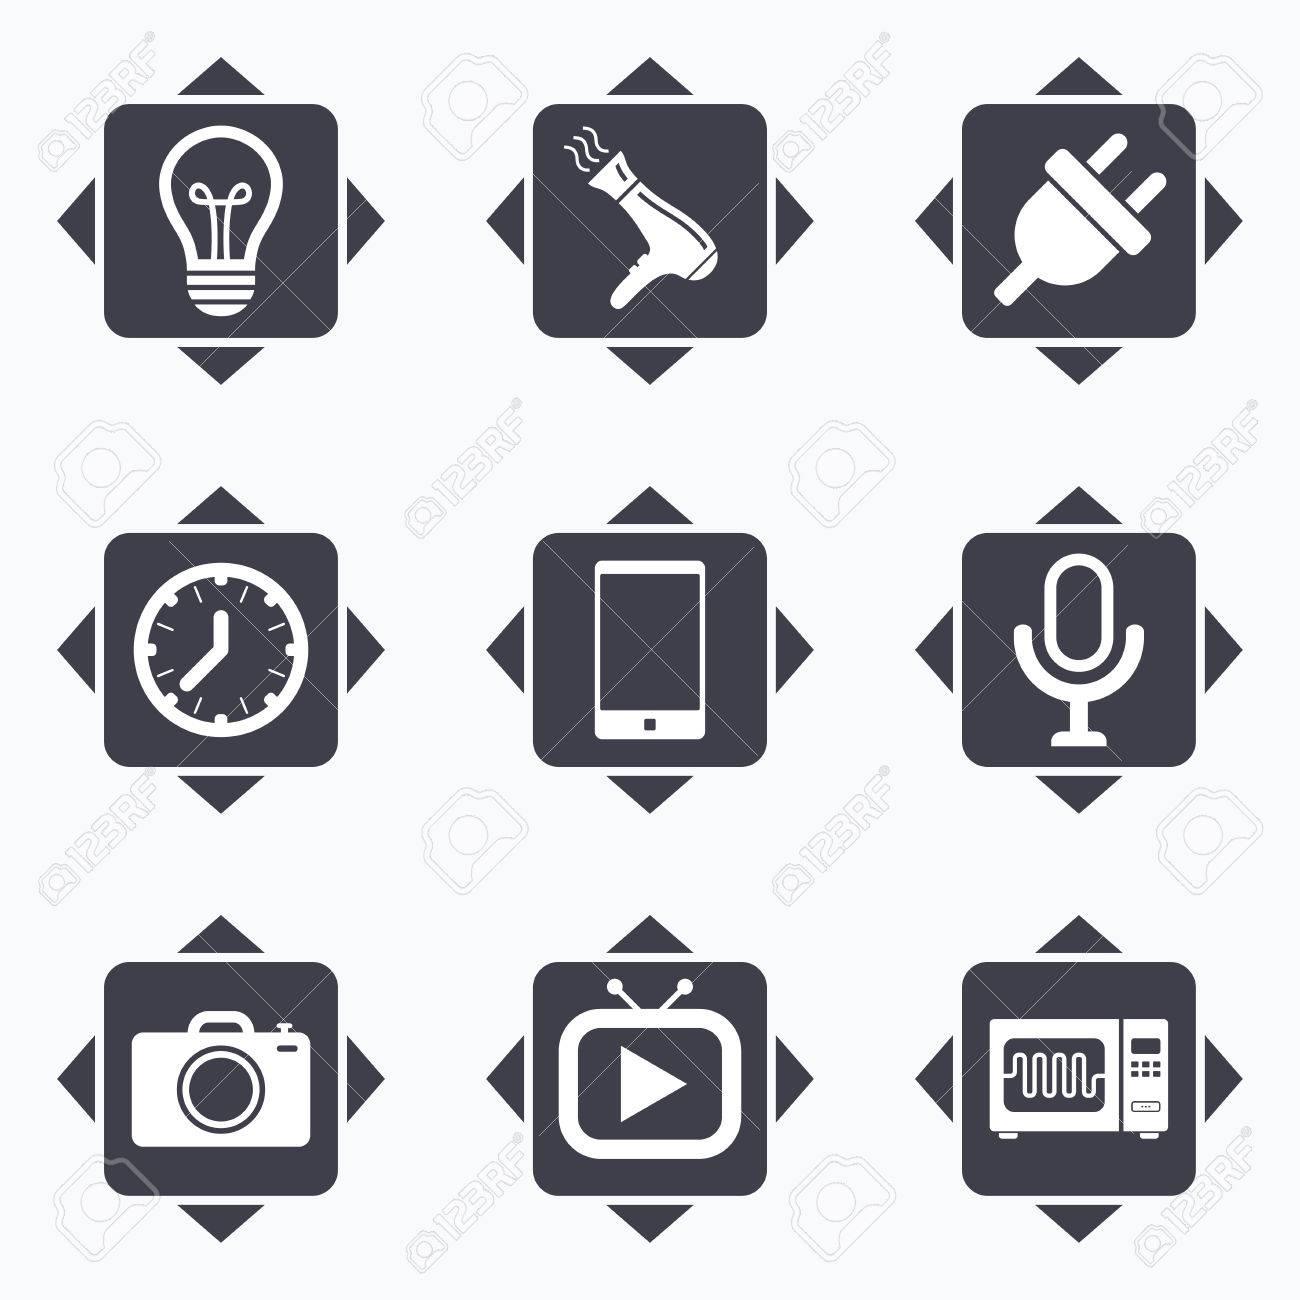 Icons Mit Richtungspfeilen. Haushaltsgeräte, Geräte-Icons ...